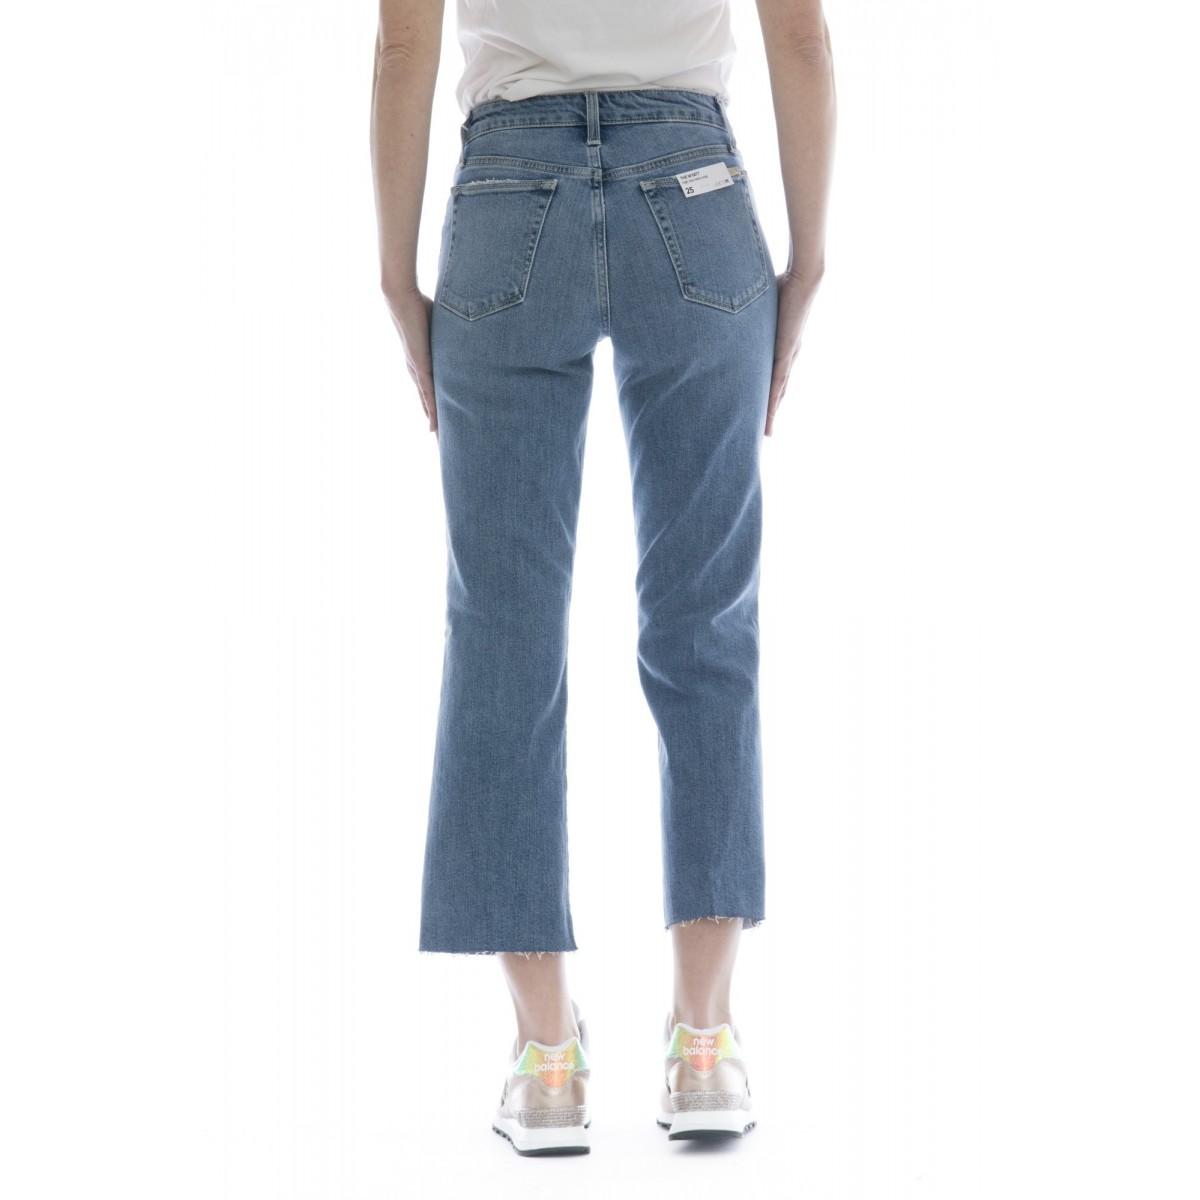 Jeans - The wyatt 5815 gamba dritta larga